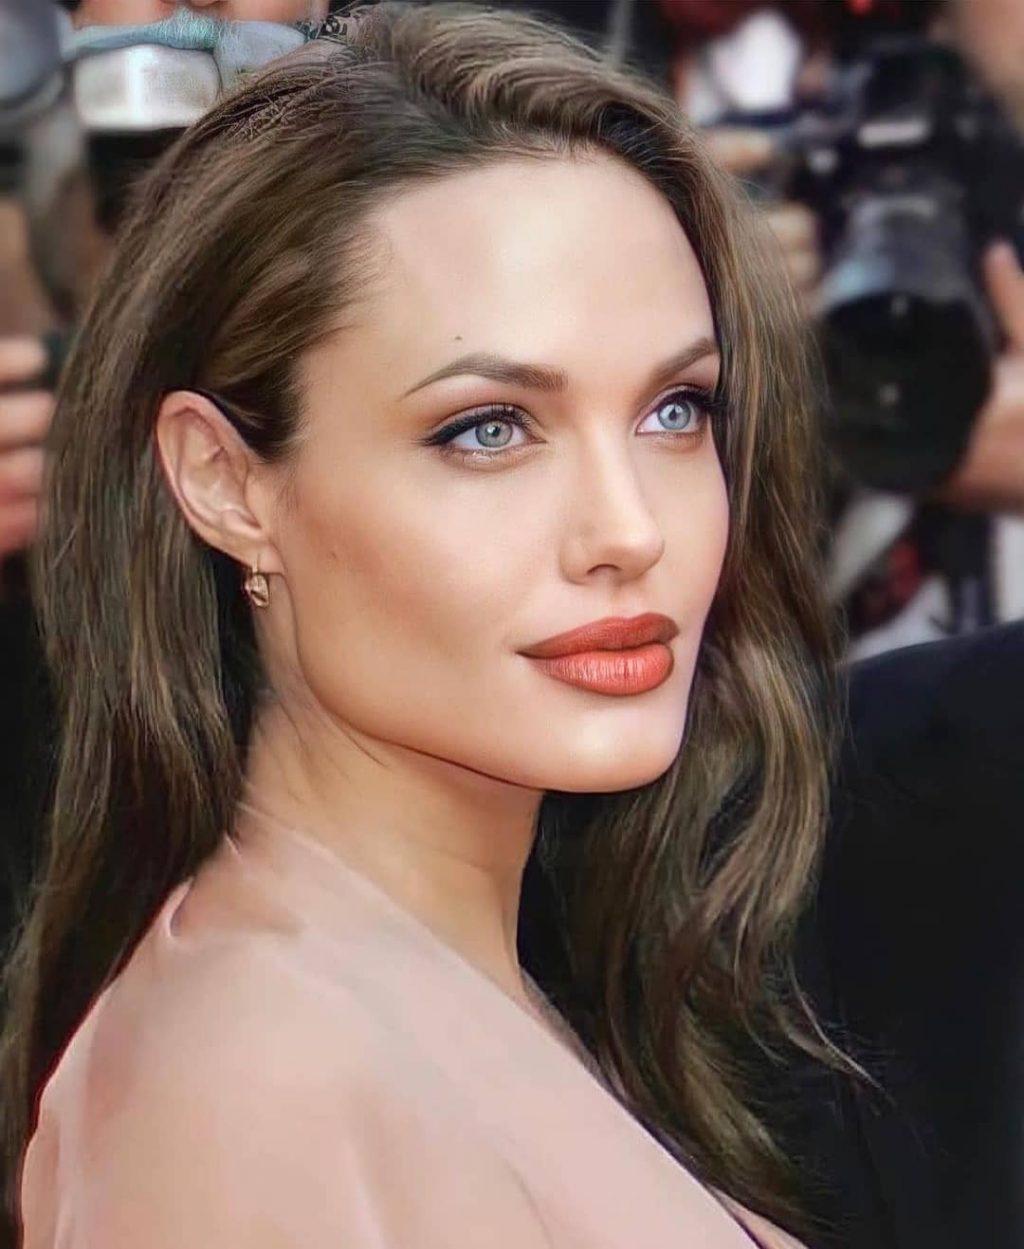 Simple makeup style - Angelina Jolie